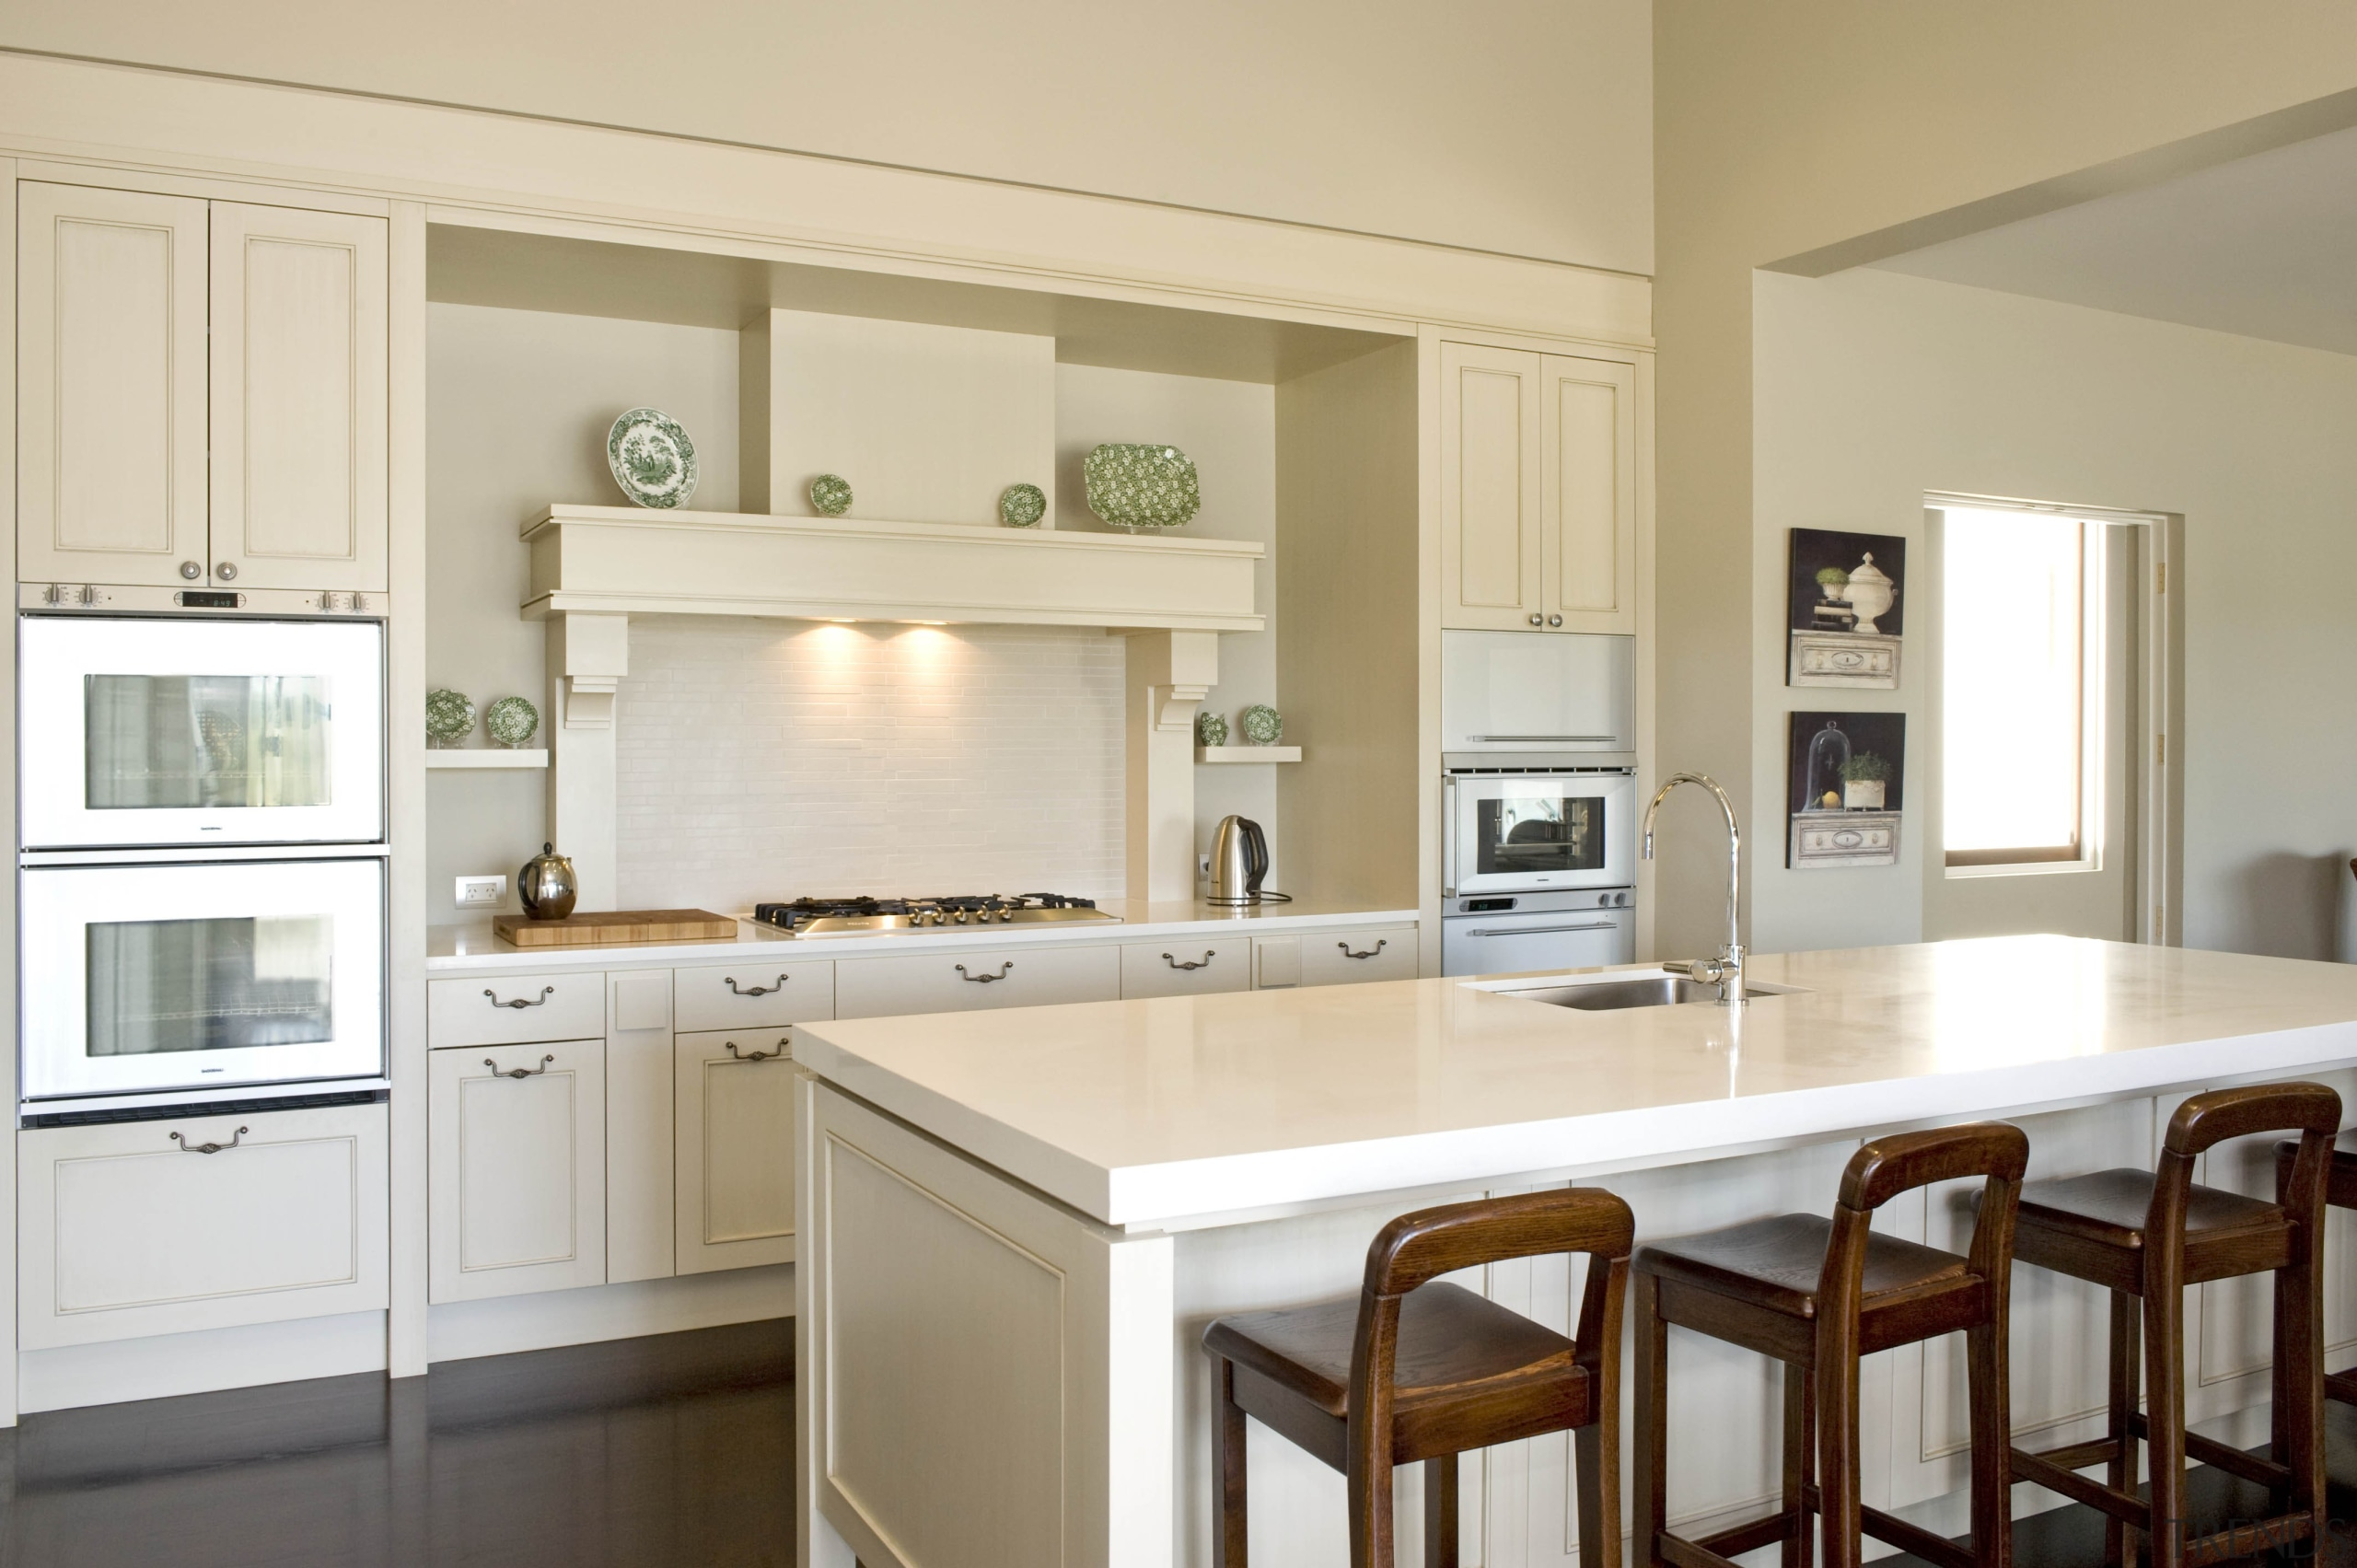 Karaka - cabinetry   countertop   cuisine classique cabinetry, countertop, cuisine classique, home, interior design, kitchen, real estate, room, gray